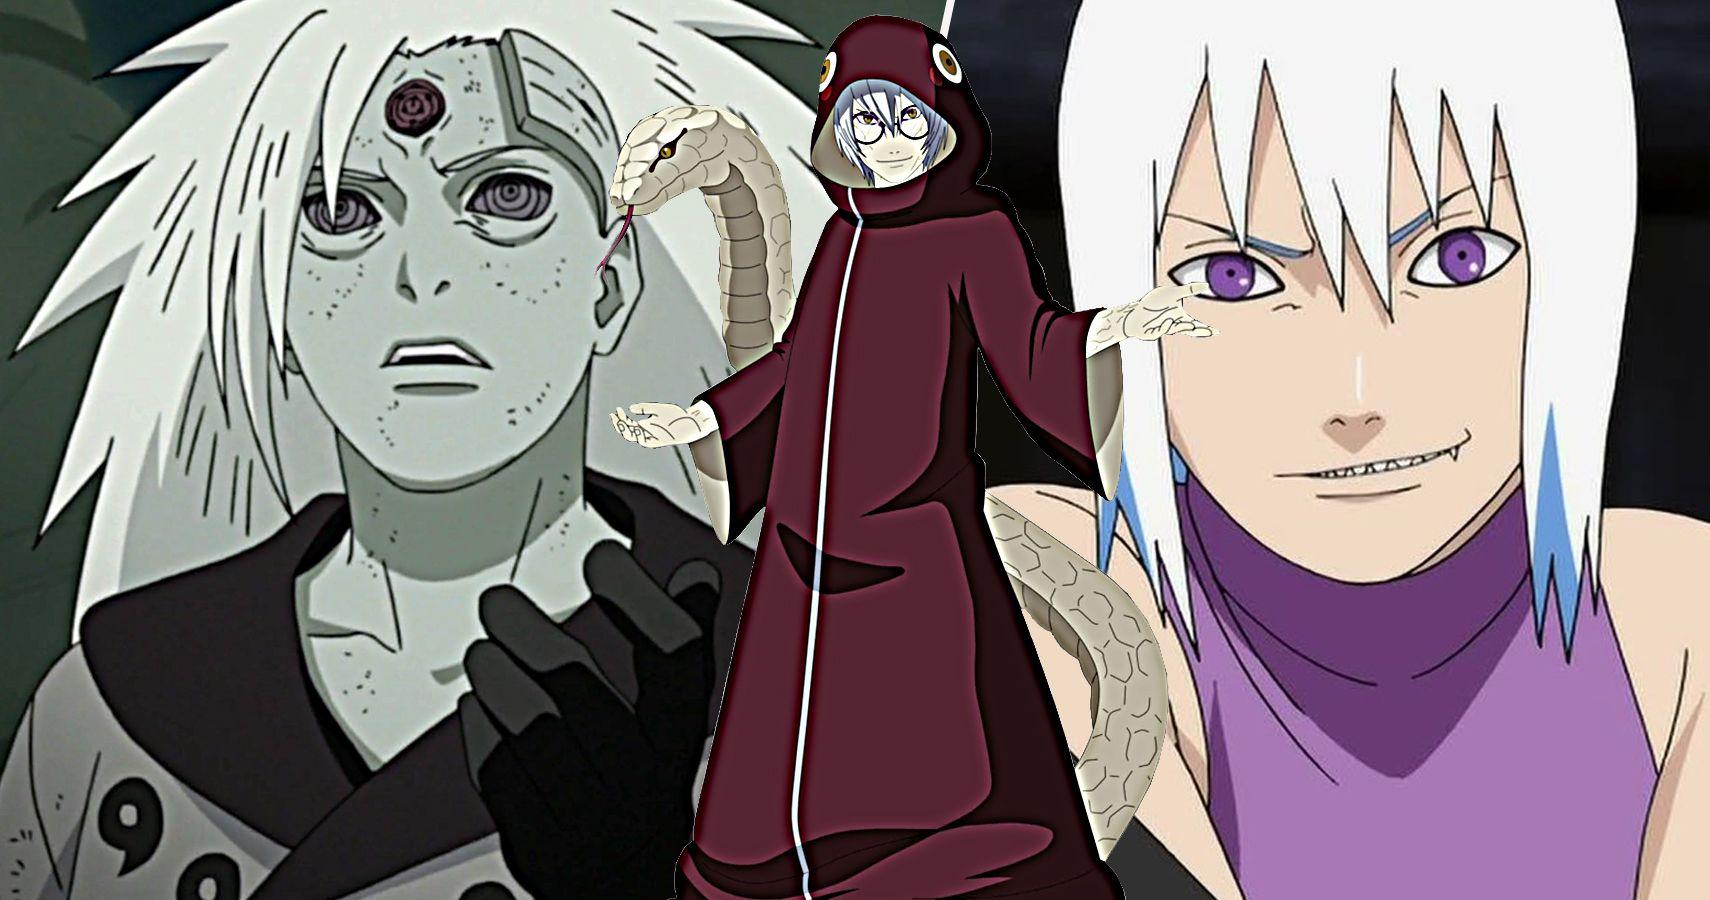 Naruto: 20 Akatsuki That Hurt The Show (And 10 That Saved It)